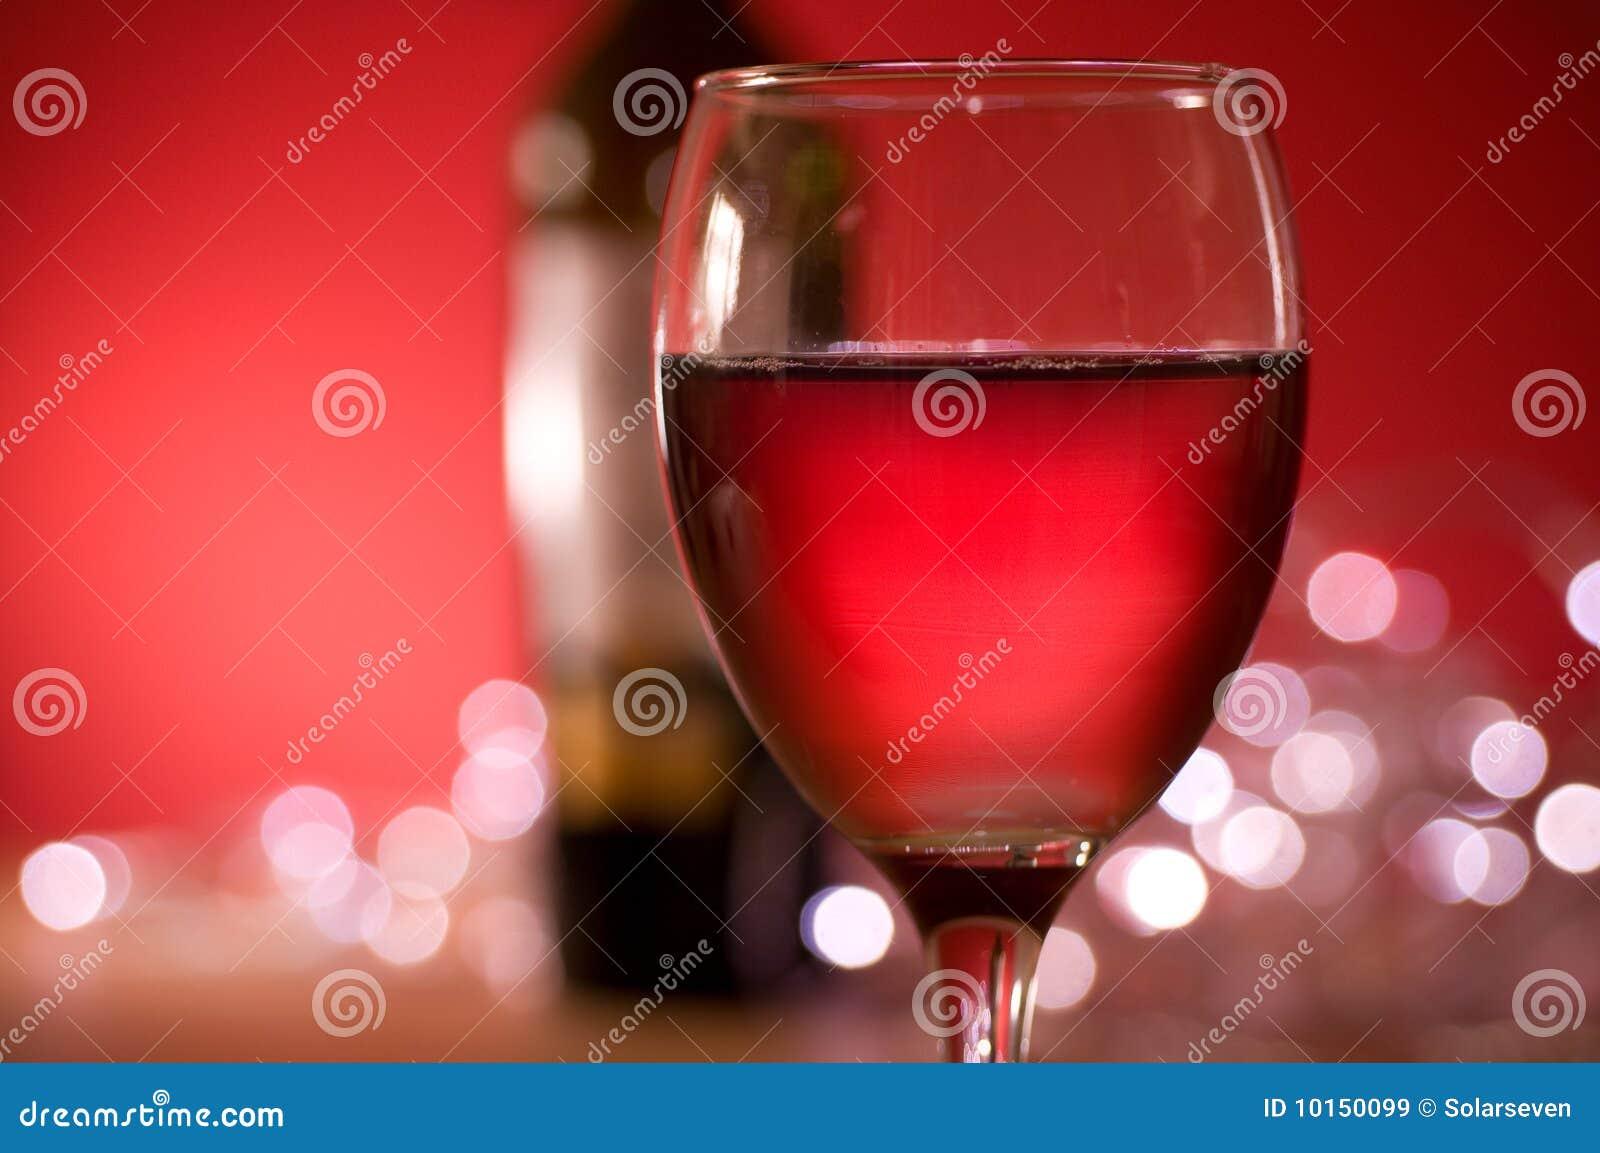 Evening Red Wine